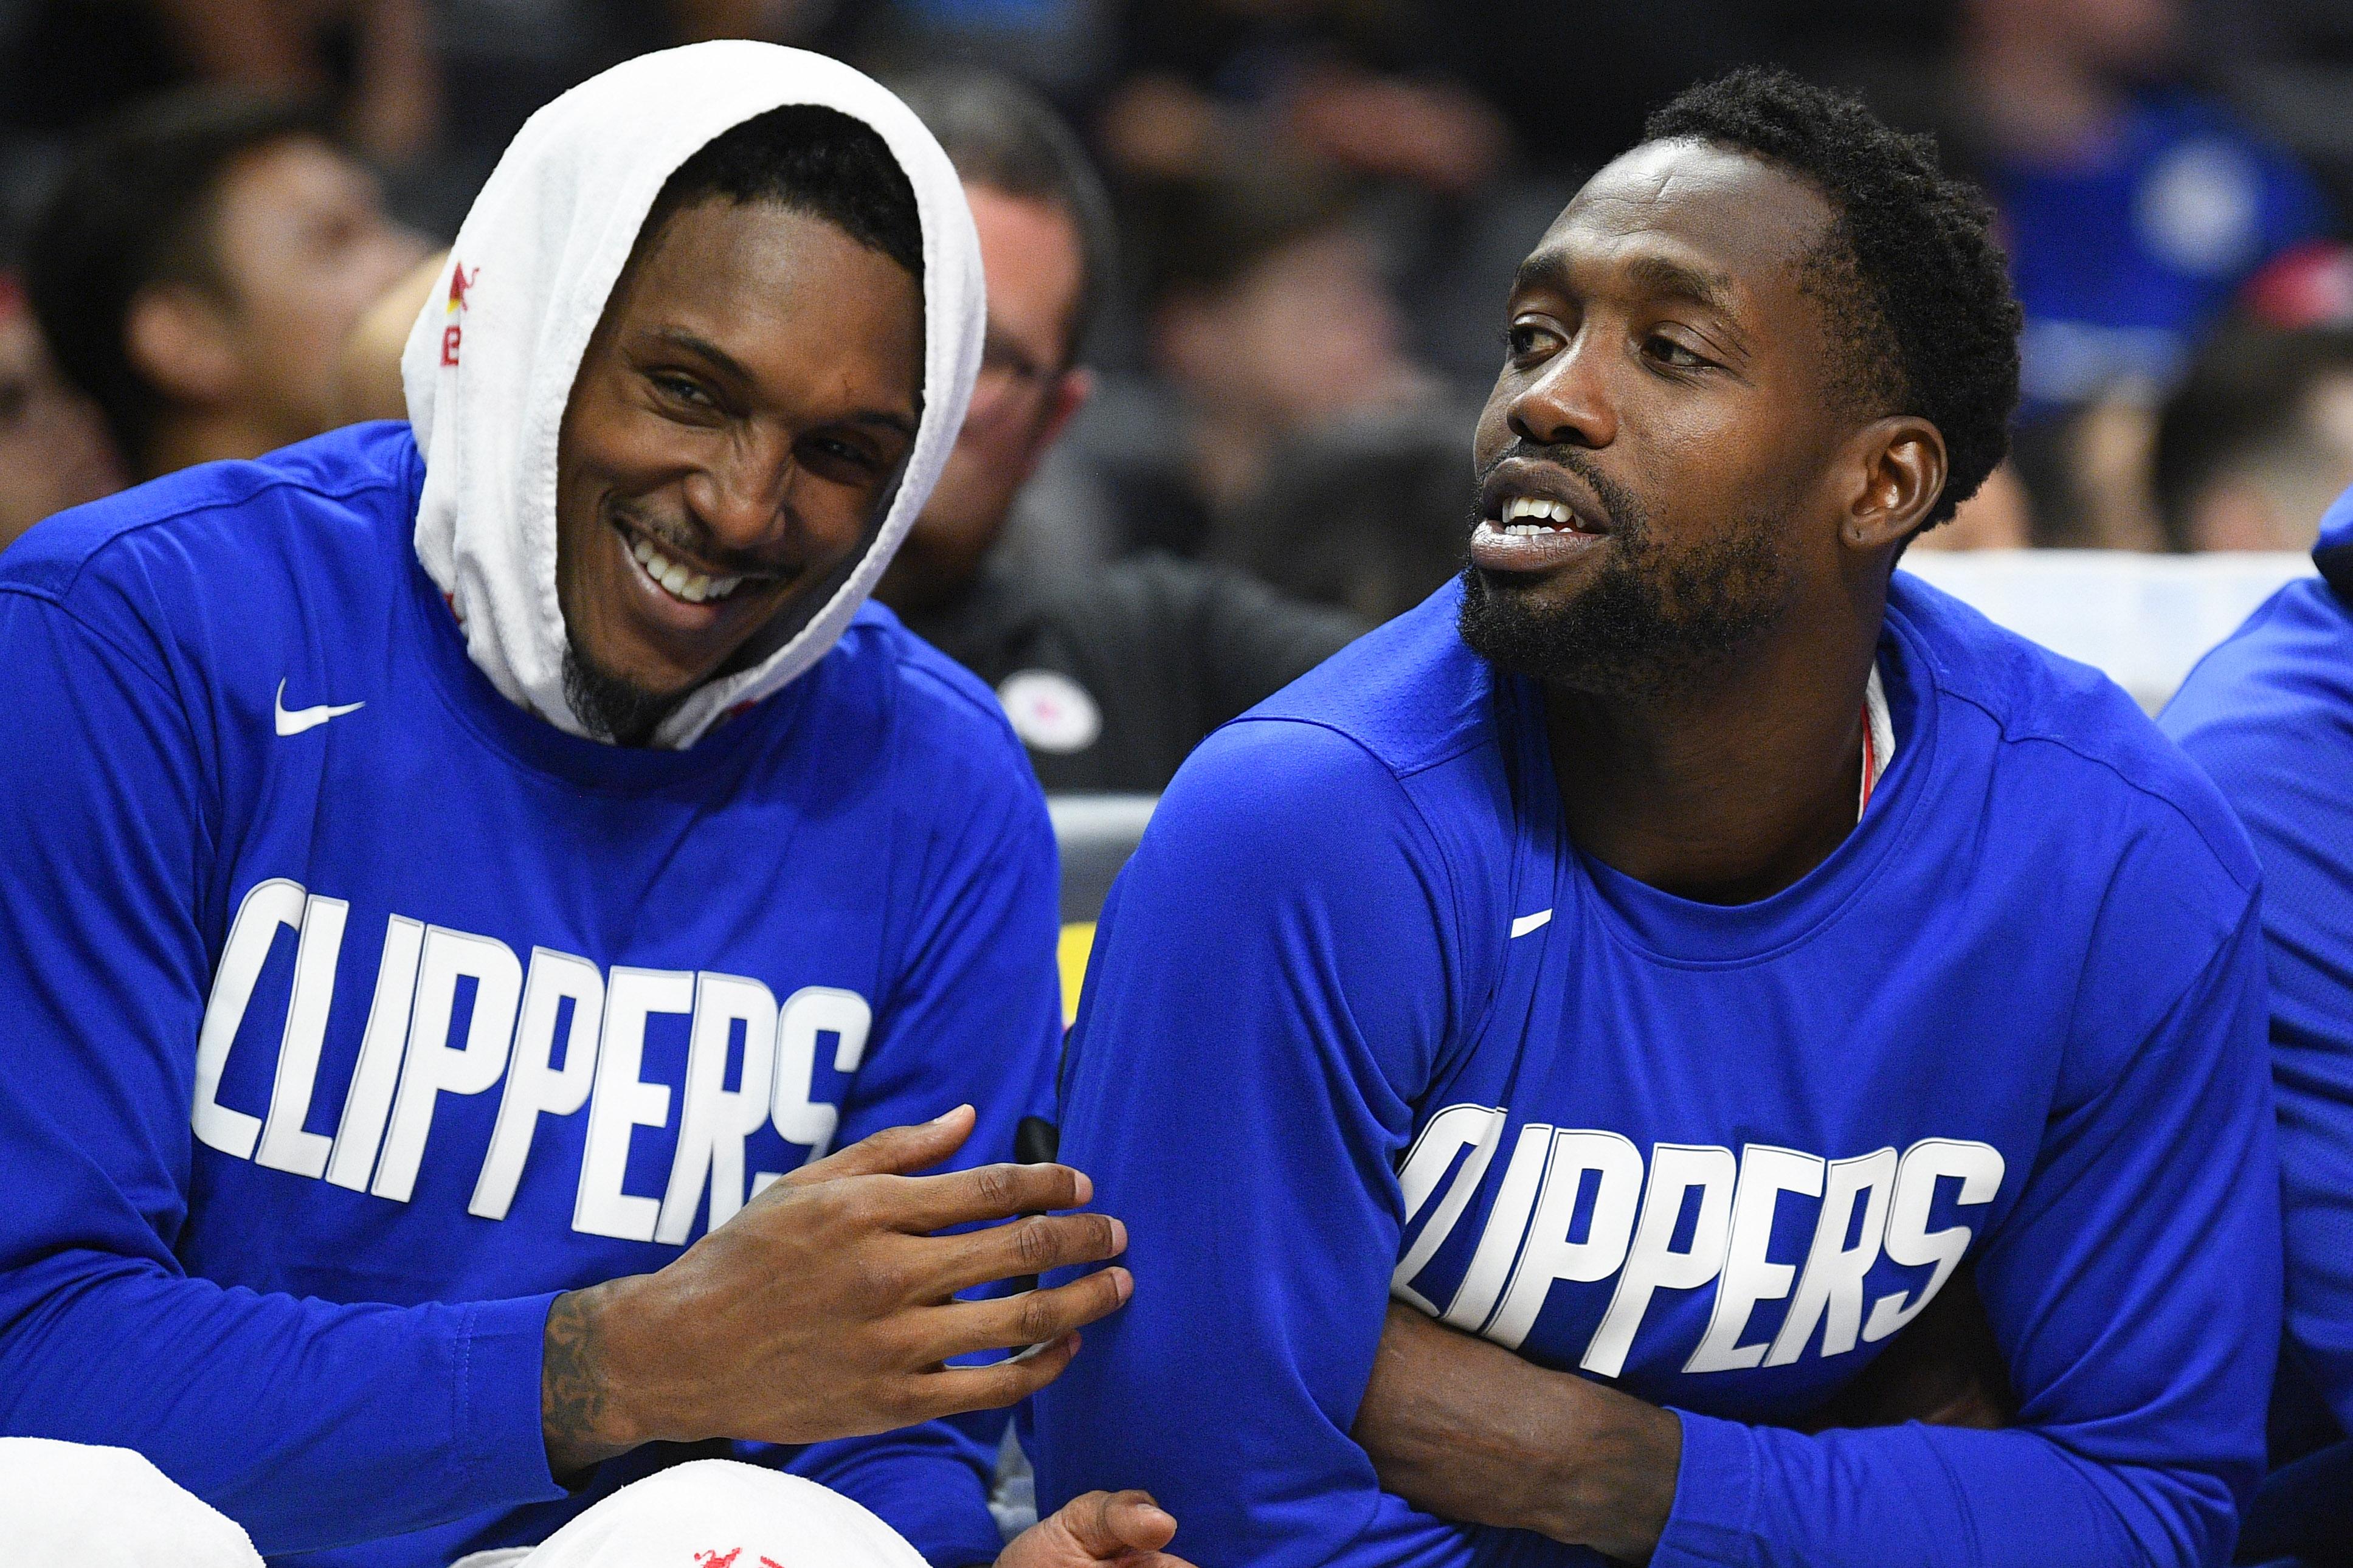 NBA: OCT 13 Preseason - Melbourne Utd at Clippers